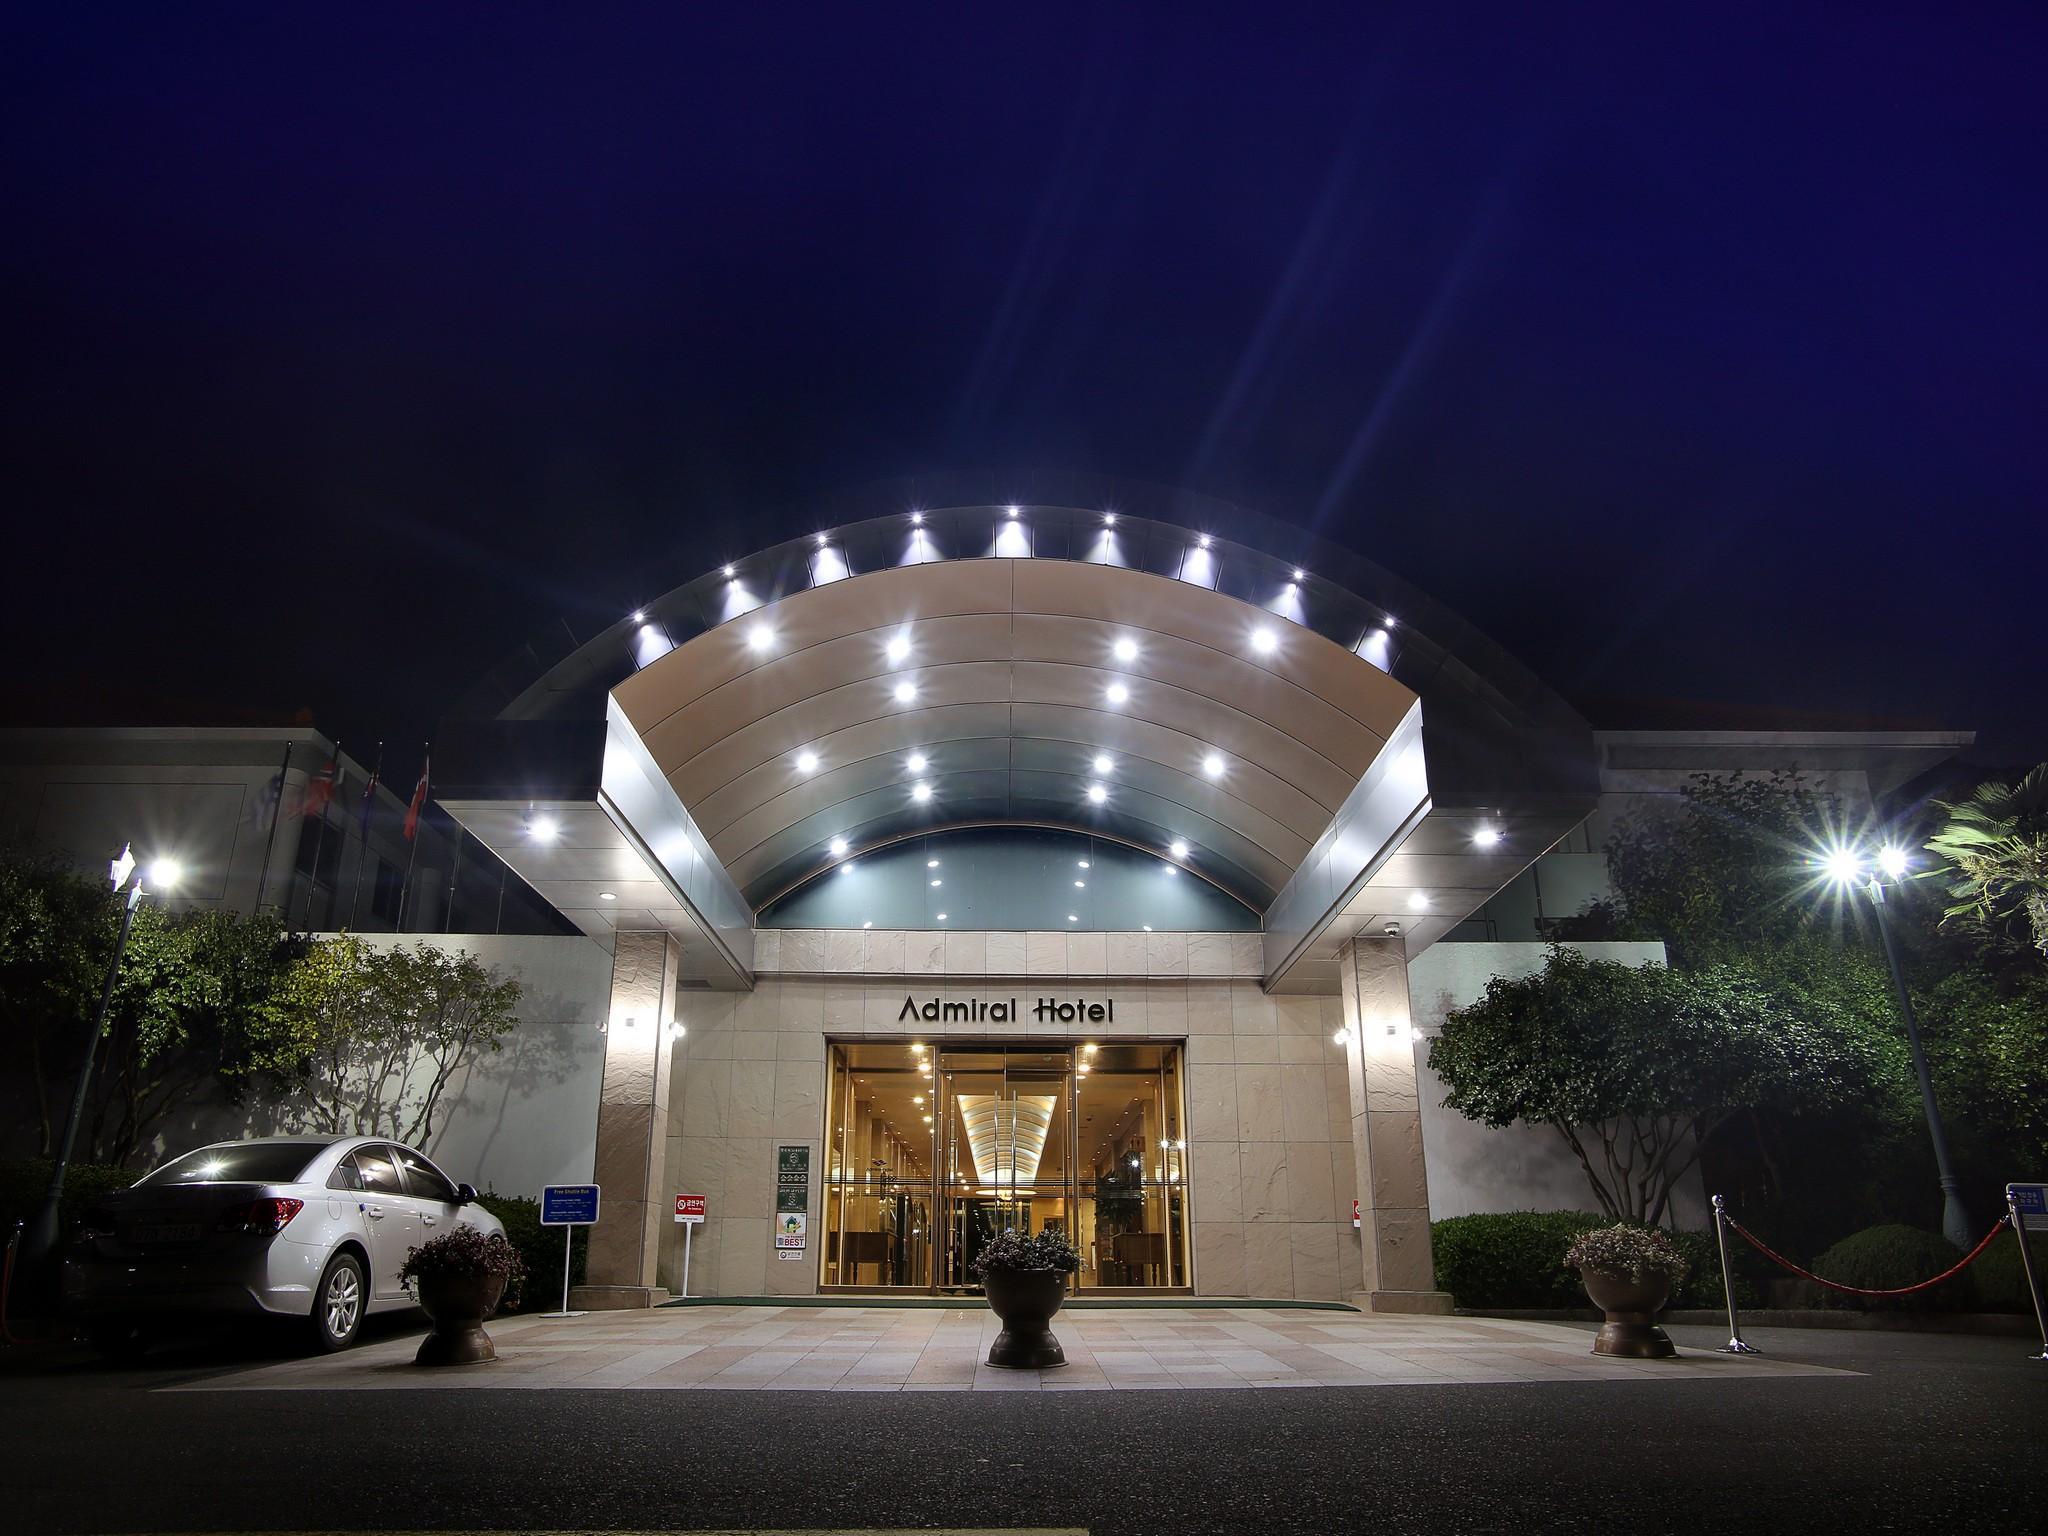 Admiral Hotel, Geoje